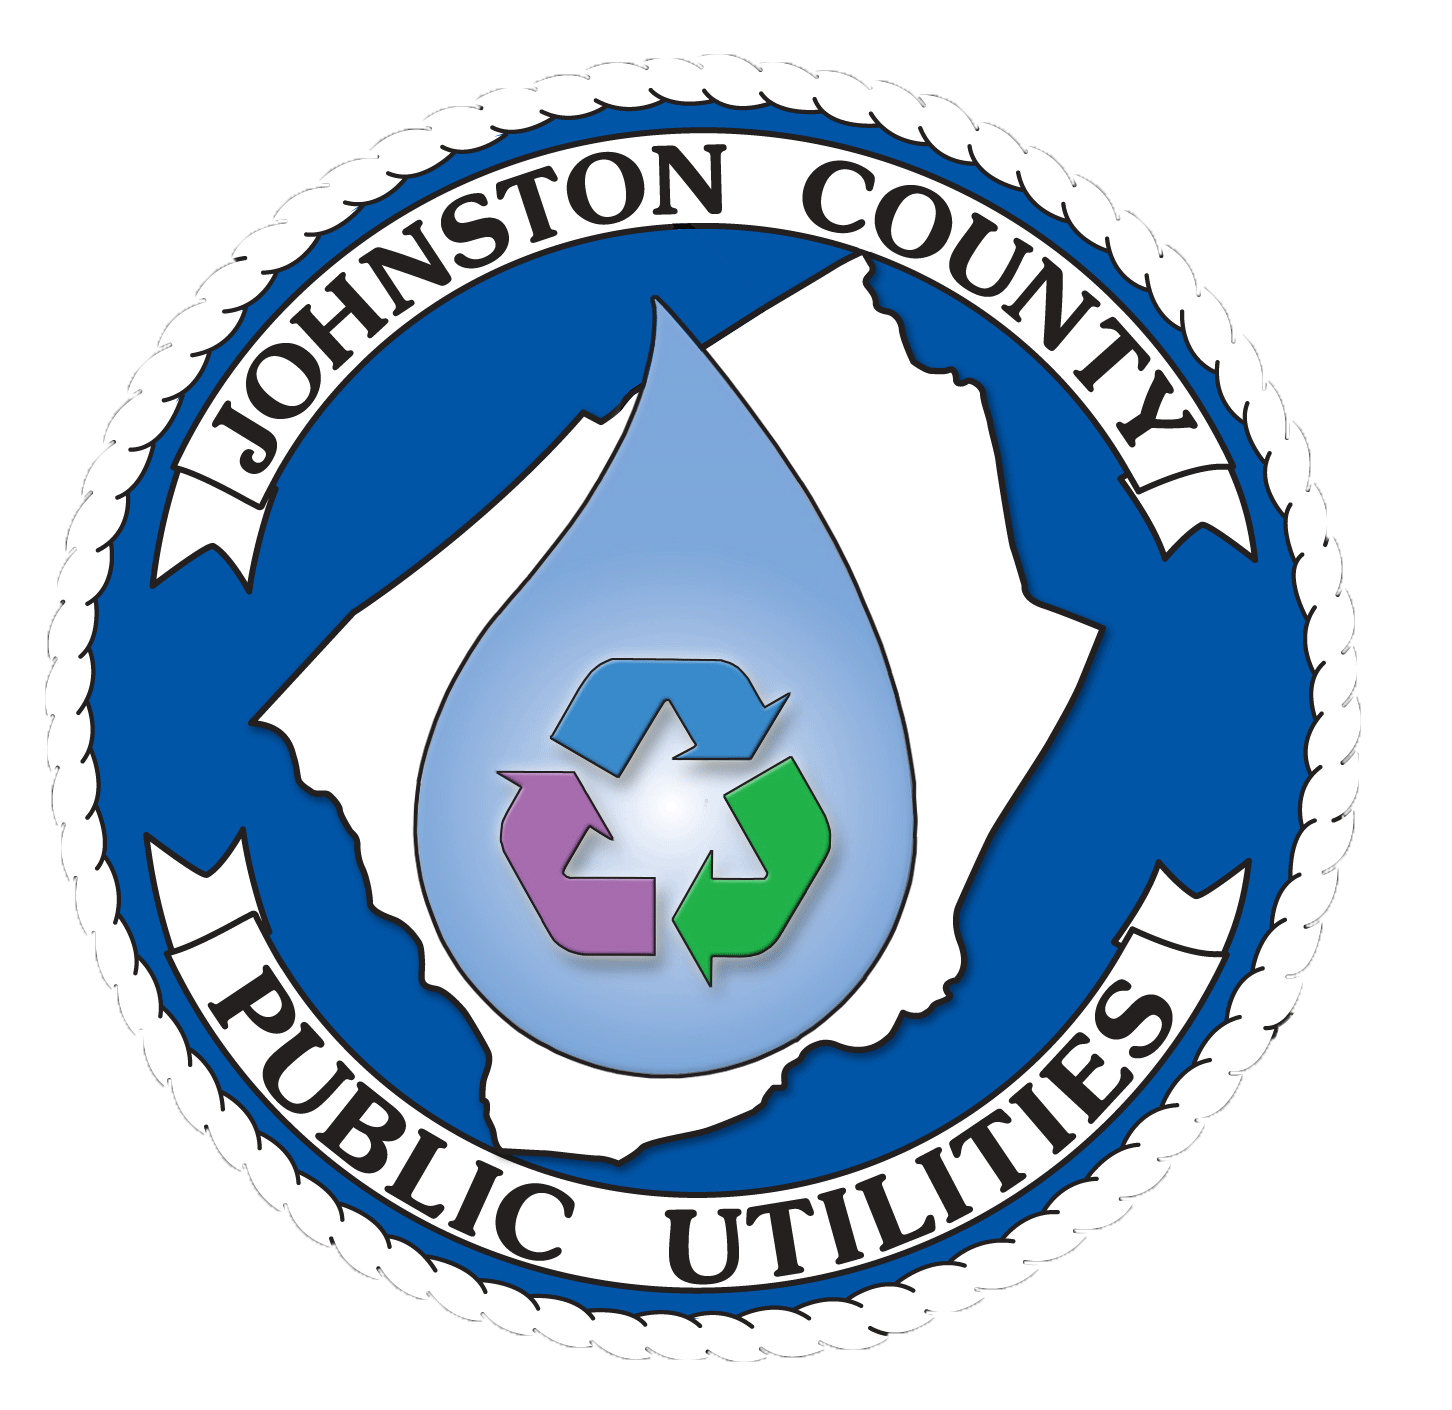 Johnston County Public Utilities